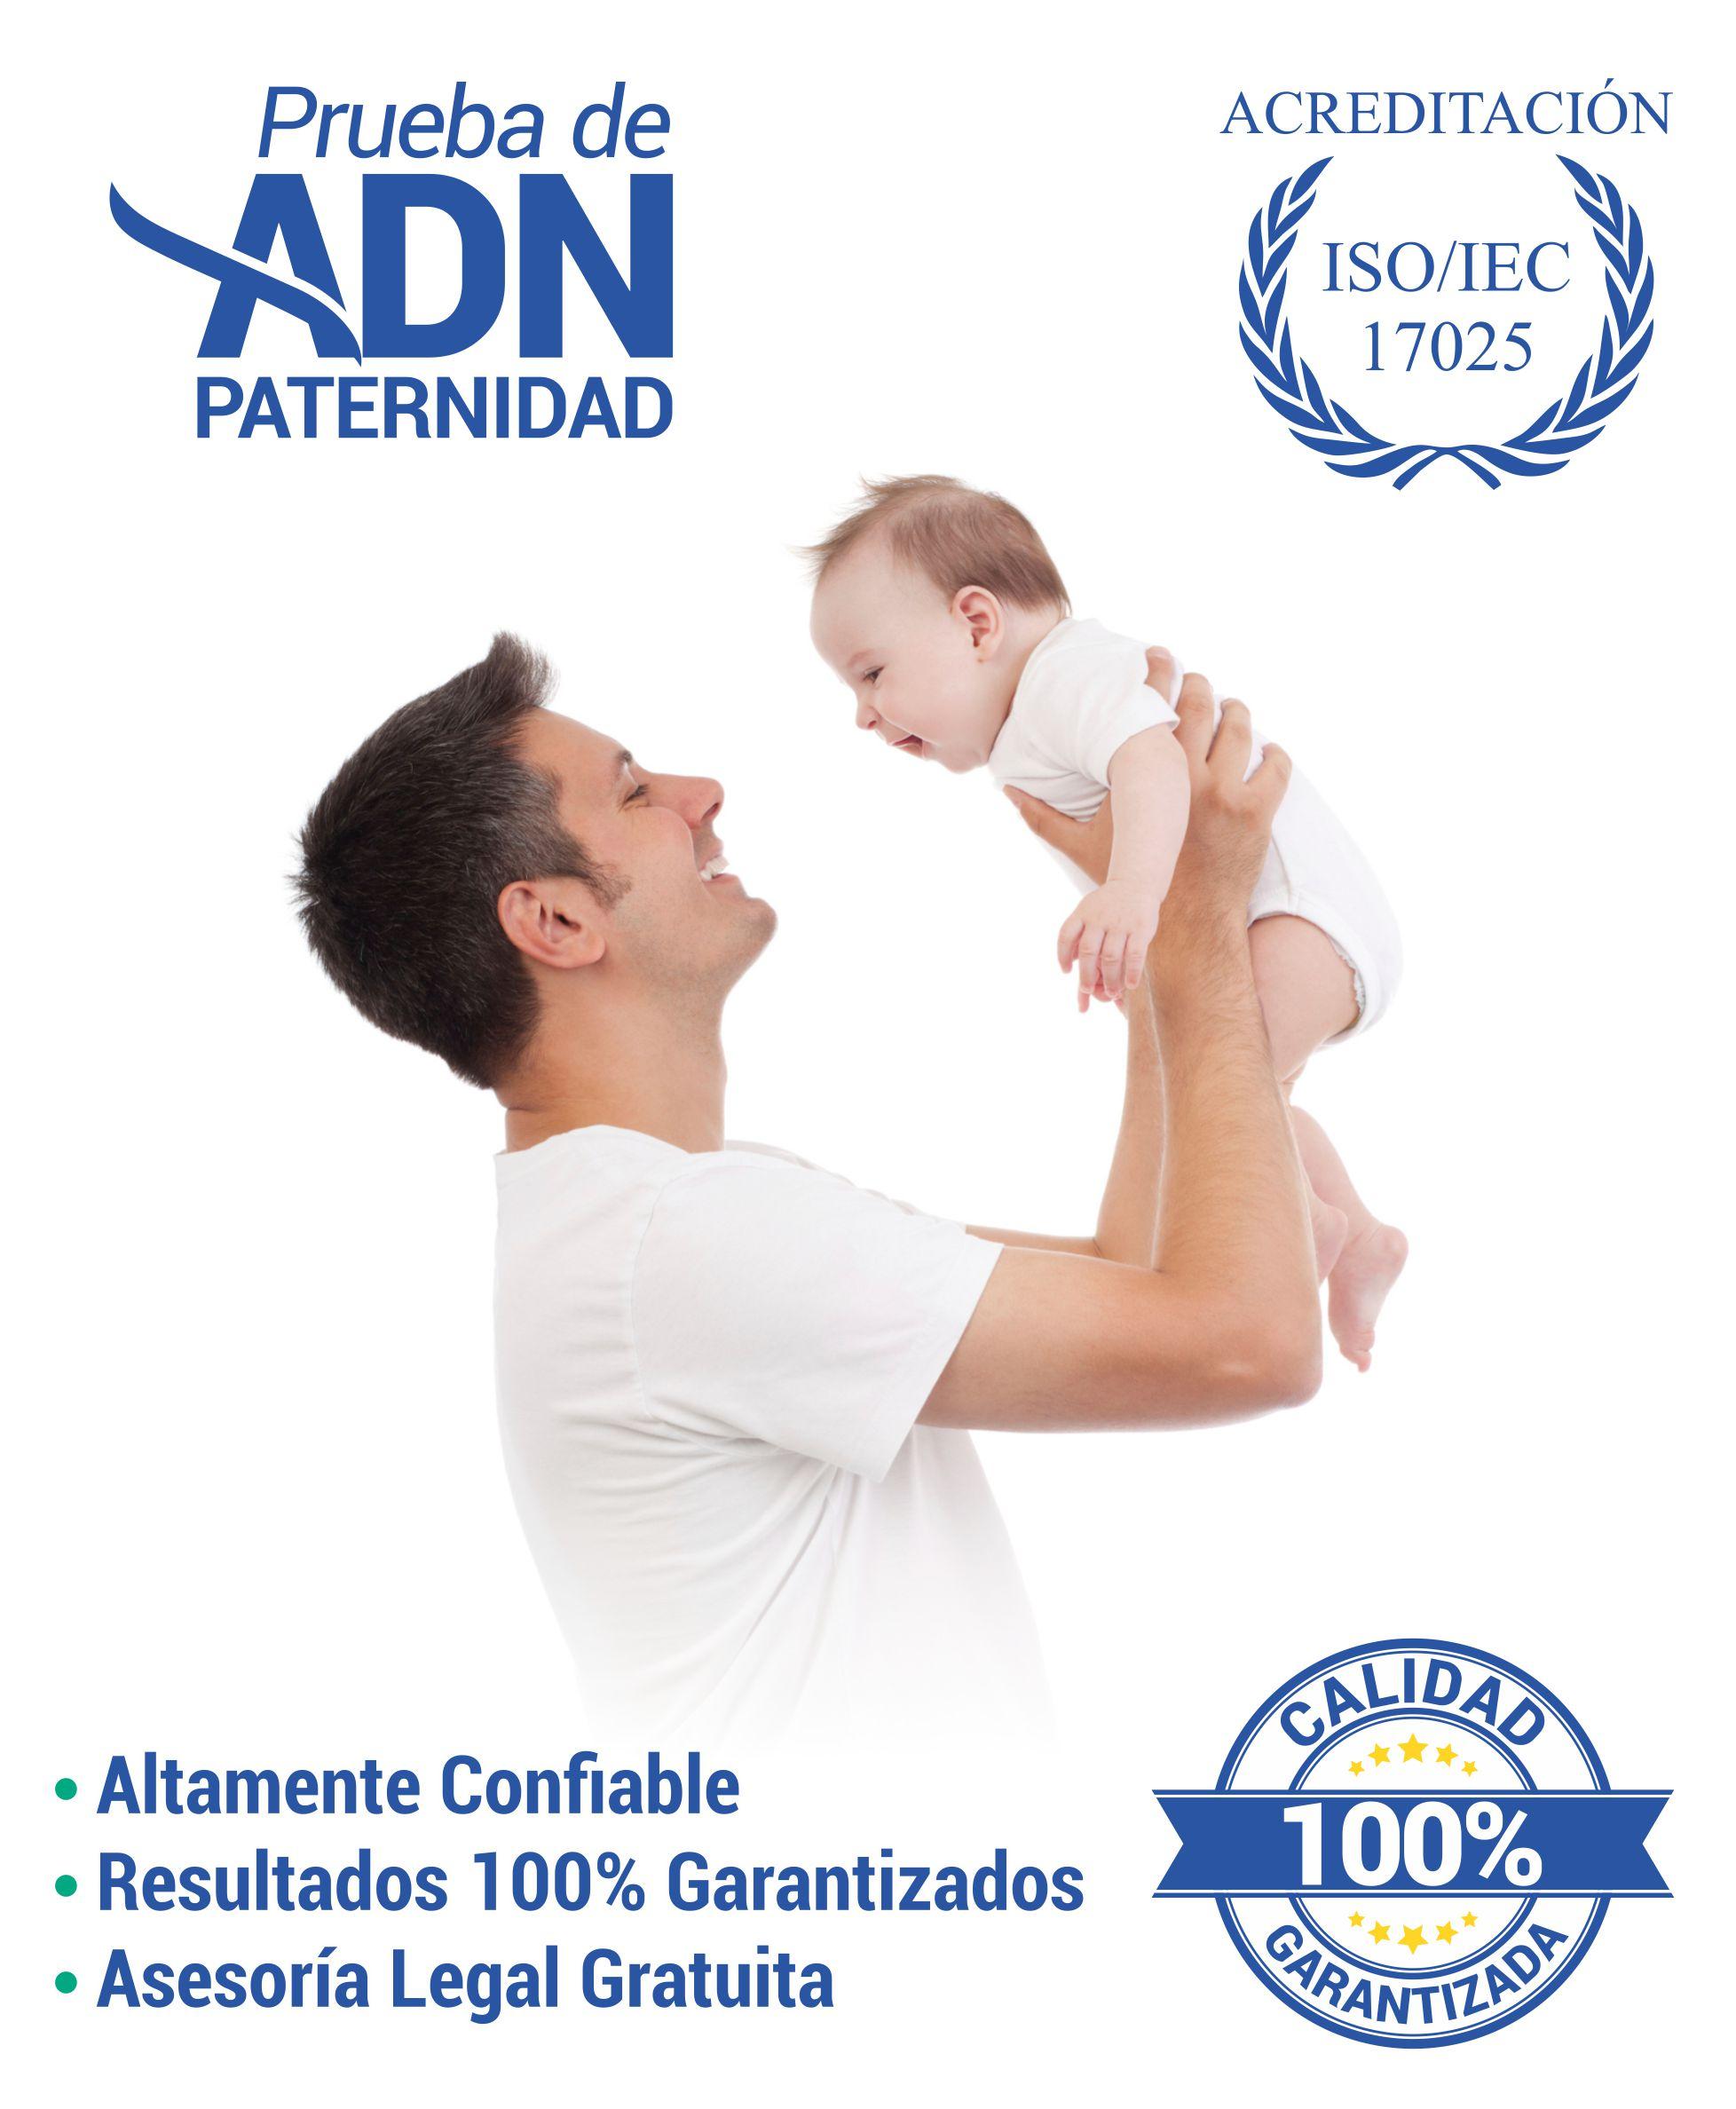 ADN Paternidad